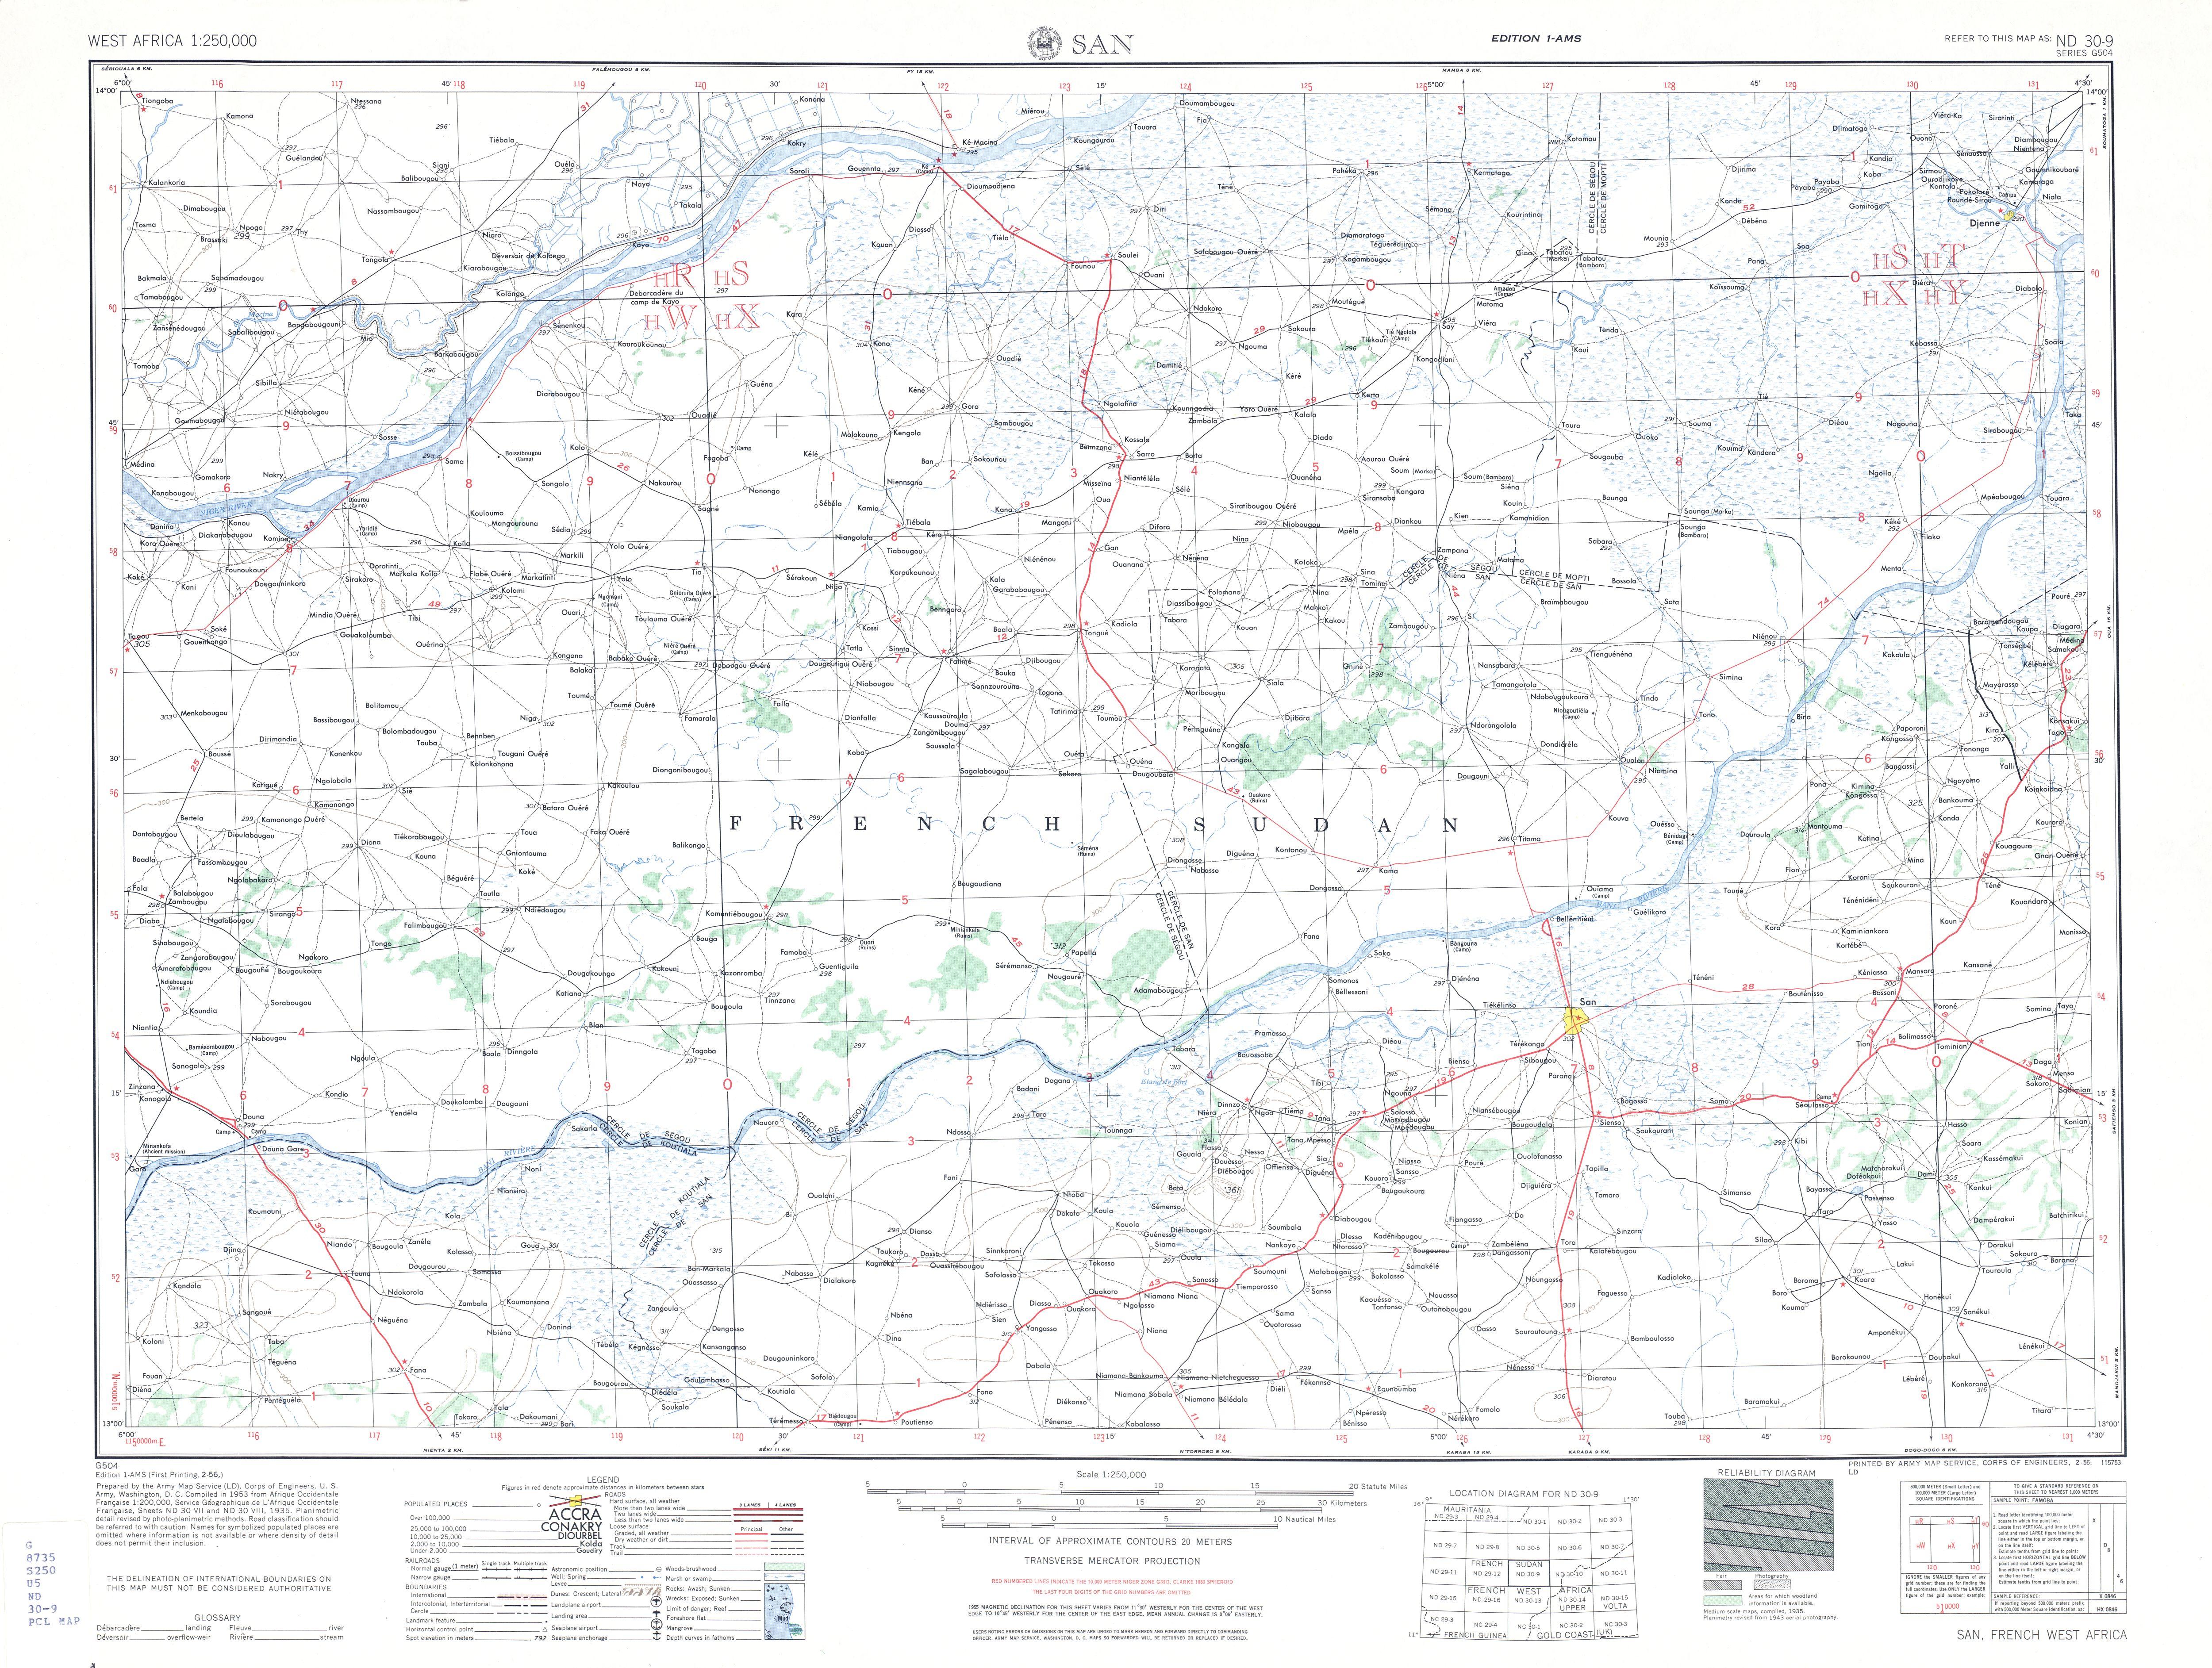 Hoja San del Mapa Topográfico de África Occidental 1955